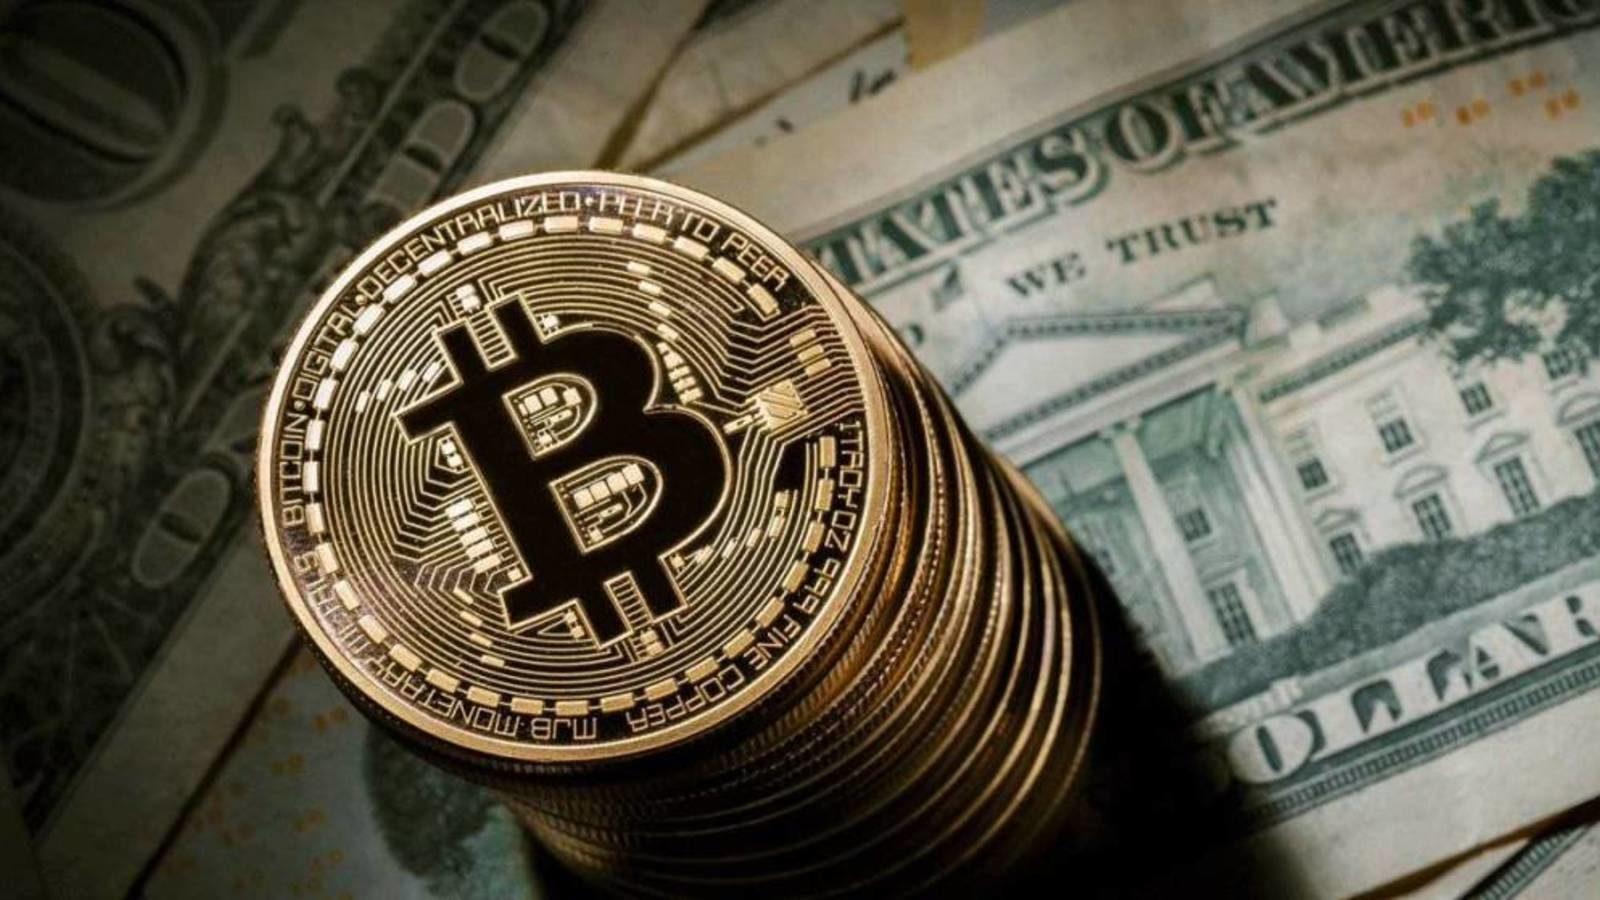 ¿Cómo convertir Bitcoin en efectivo?